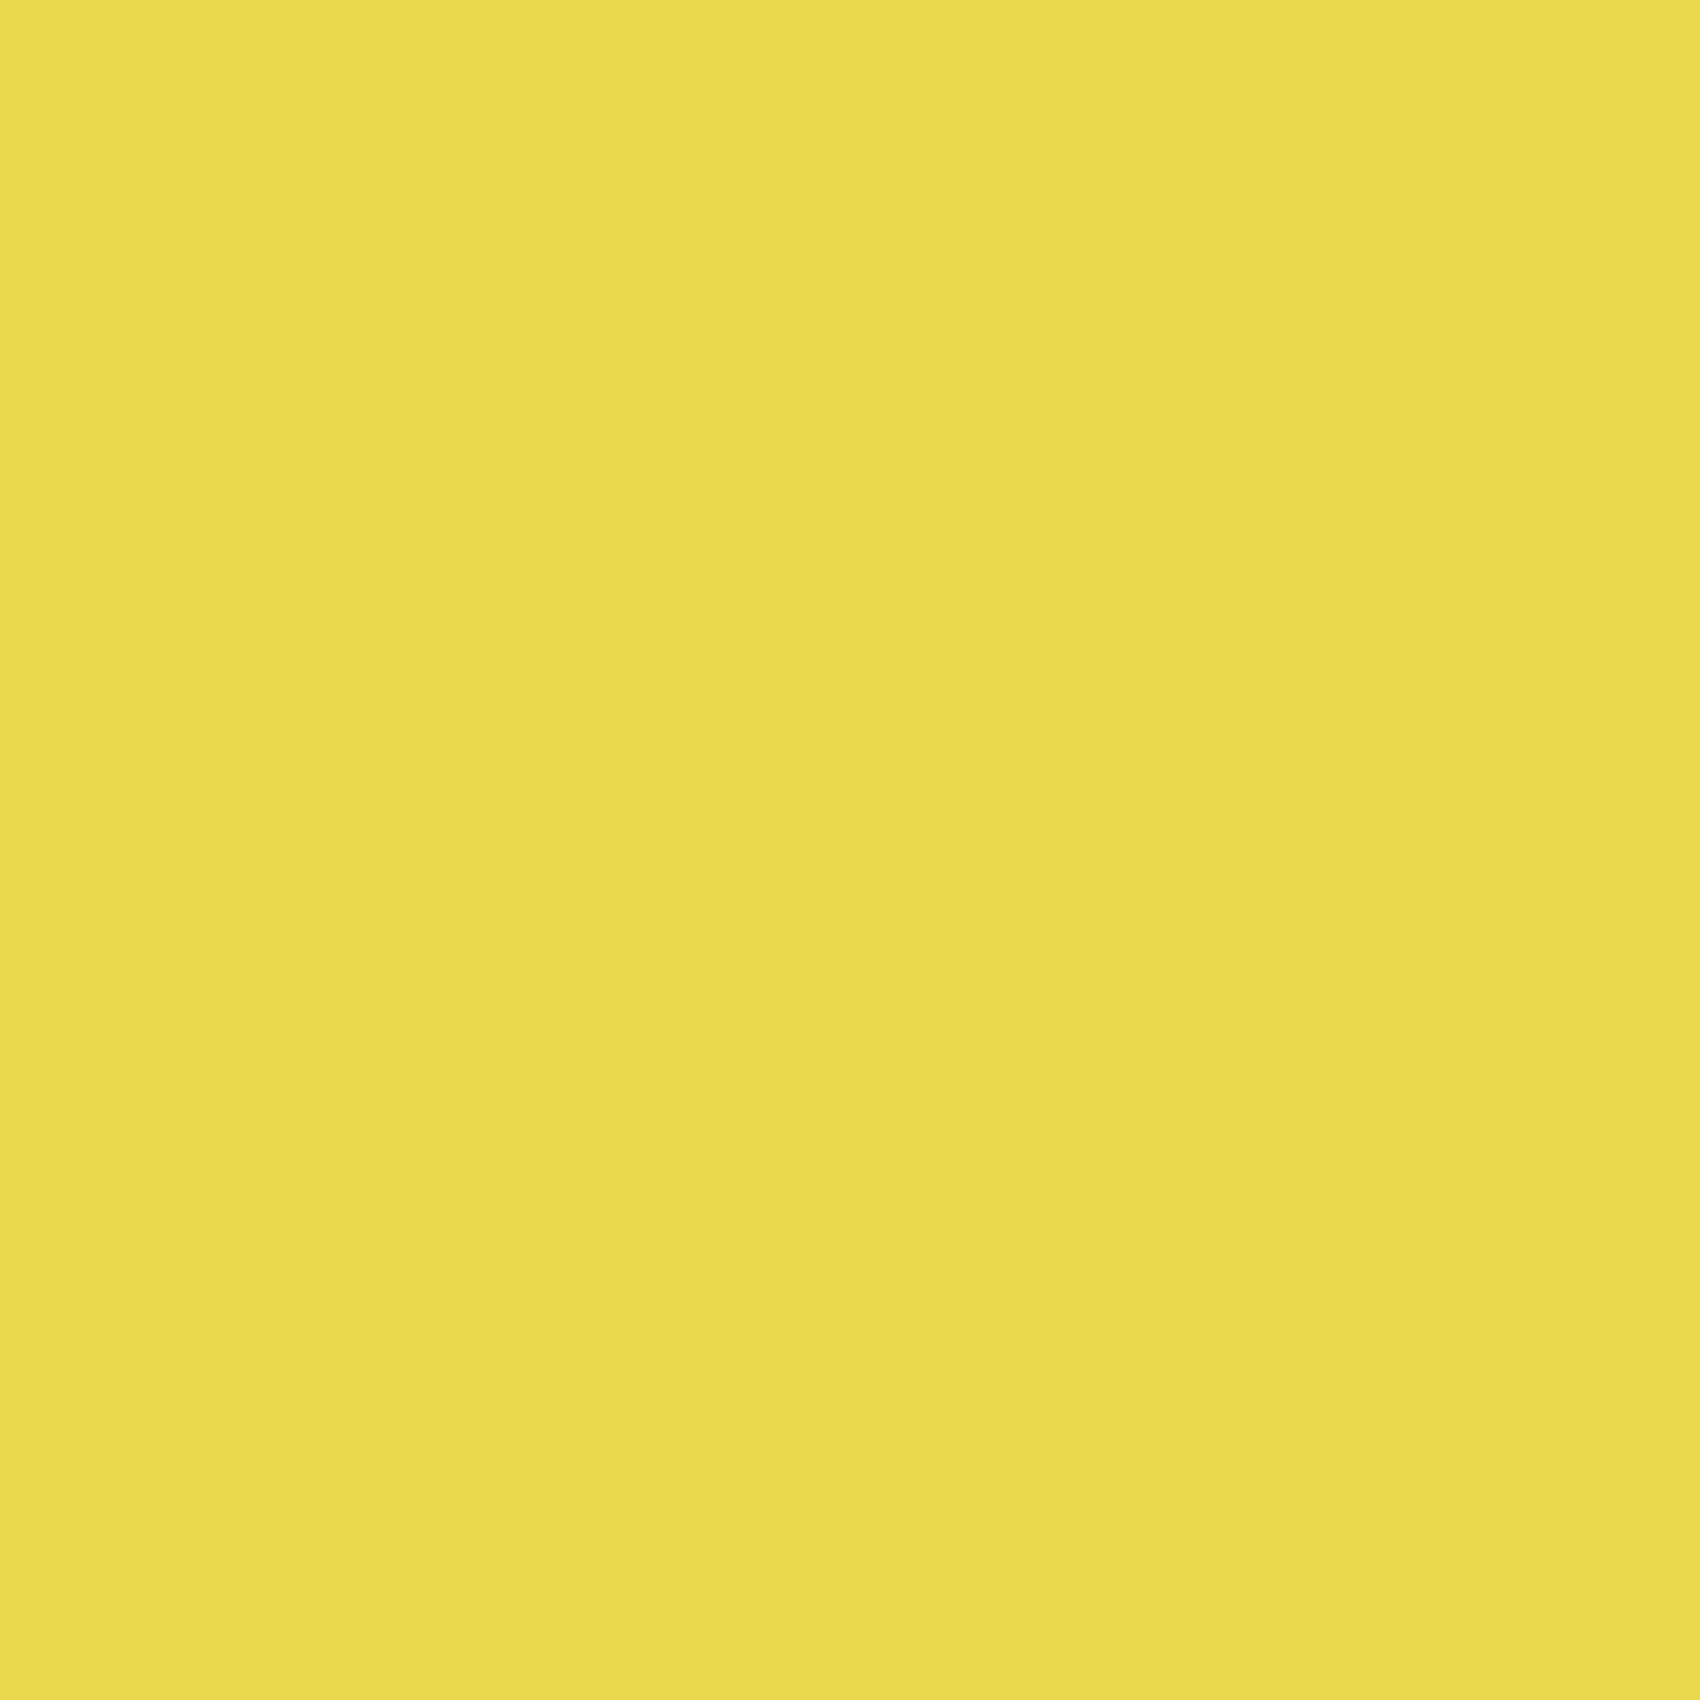 ead94c square image.jpg